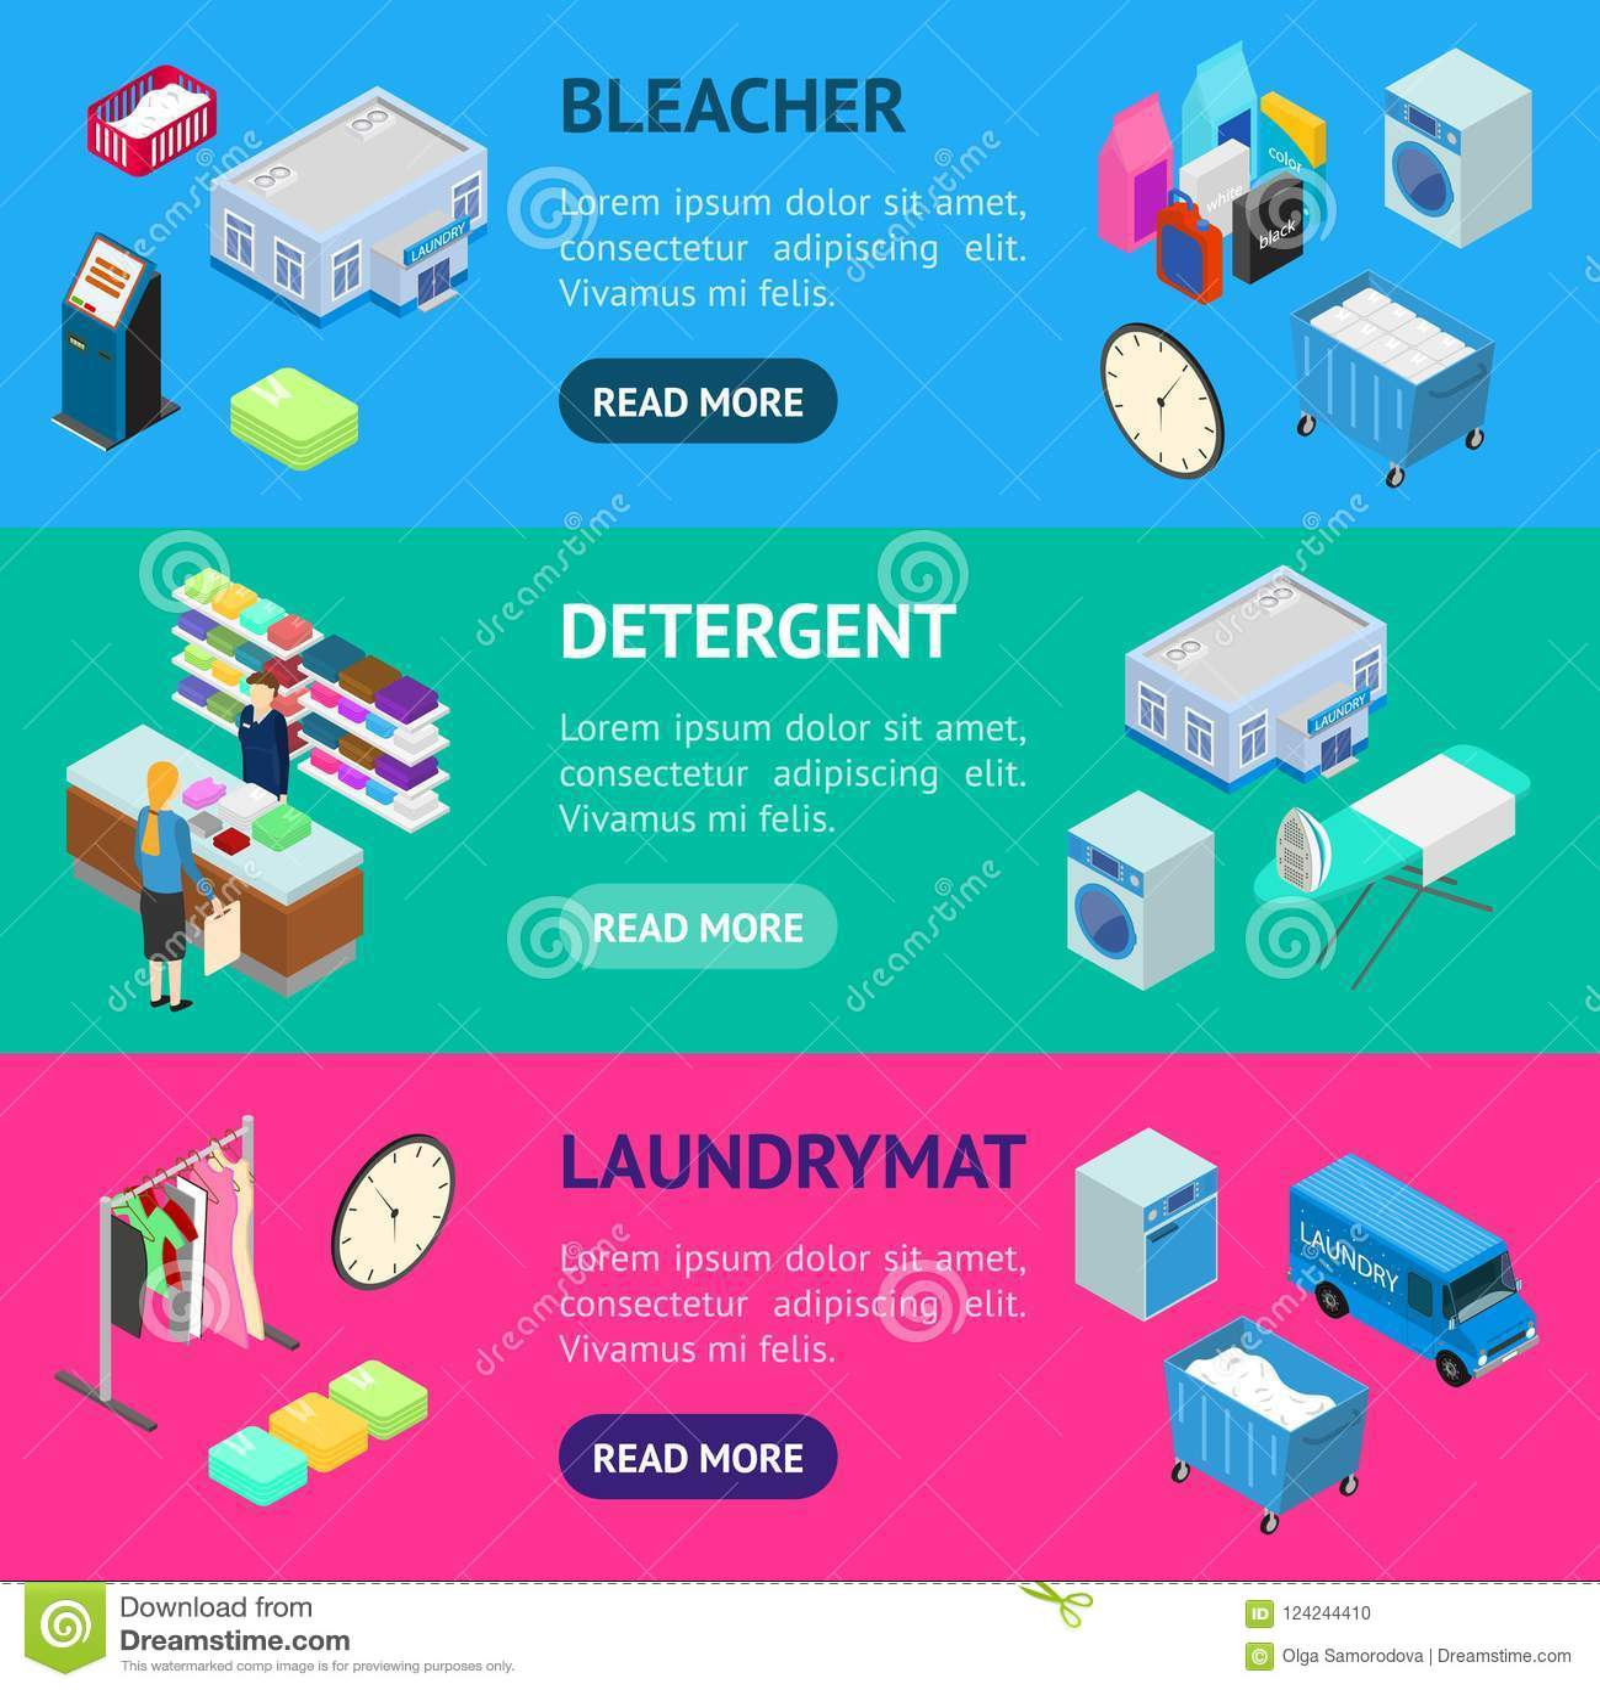 35+ Ideas For Banner Laundry Hd - Finleys Beginlys